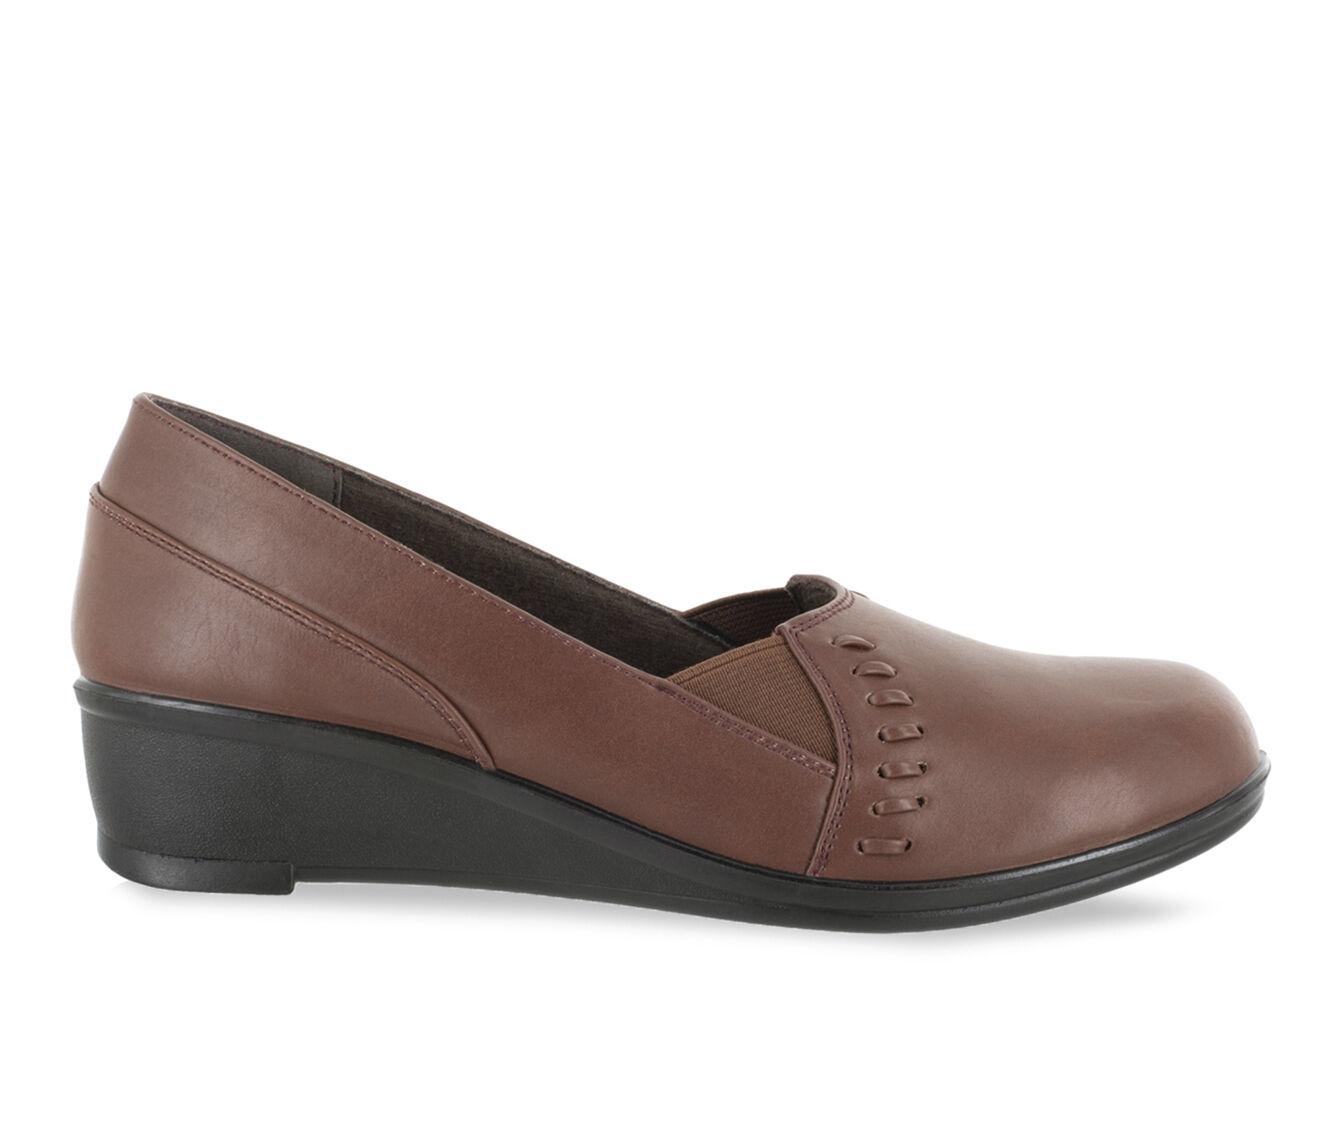 uk shoes_kd5749